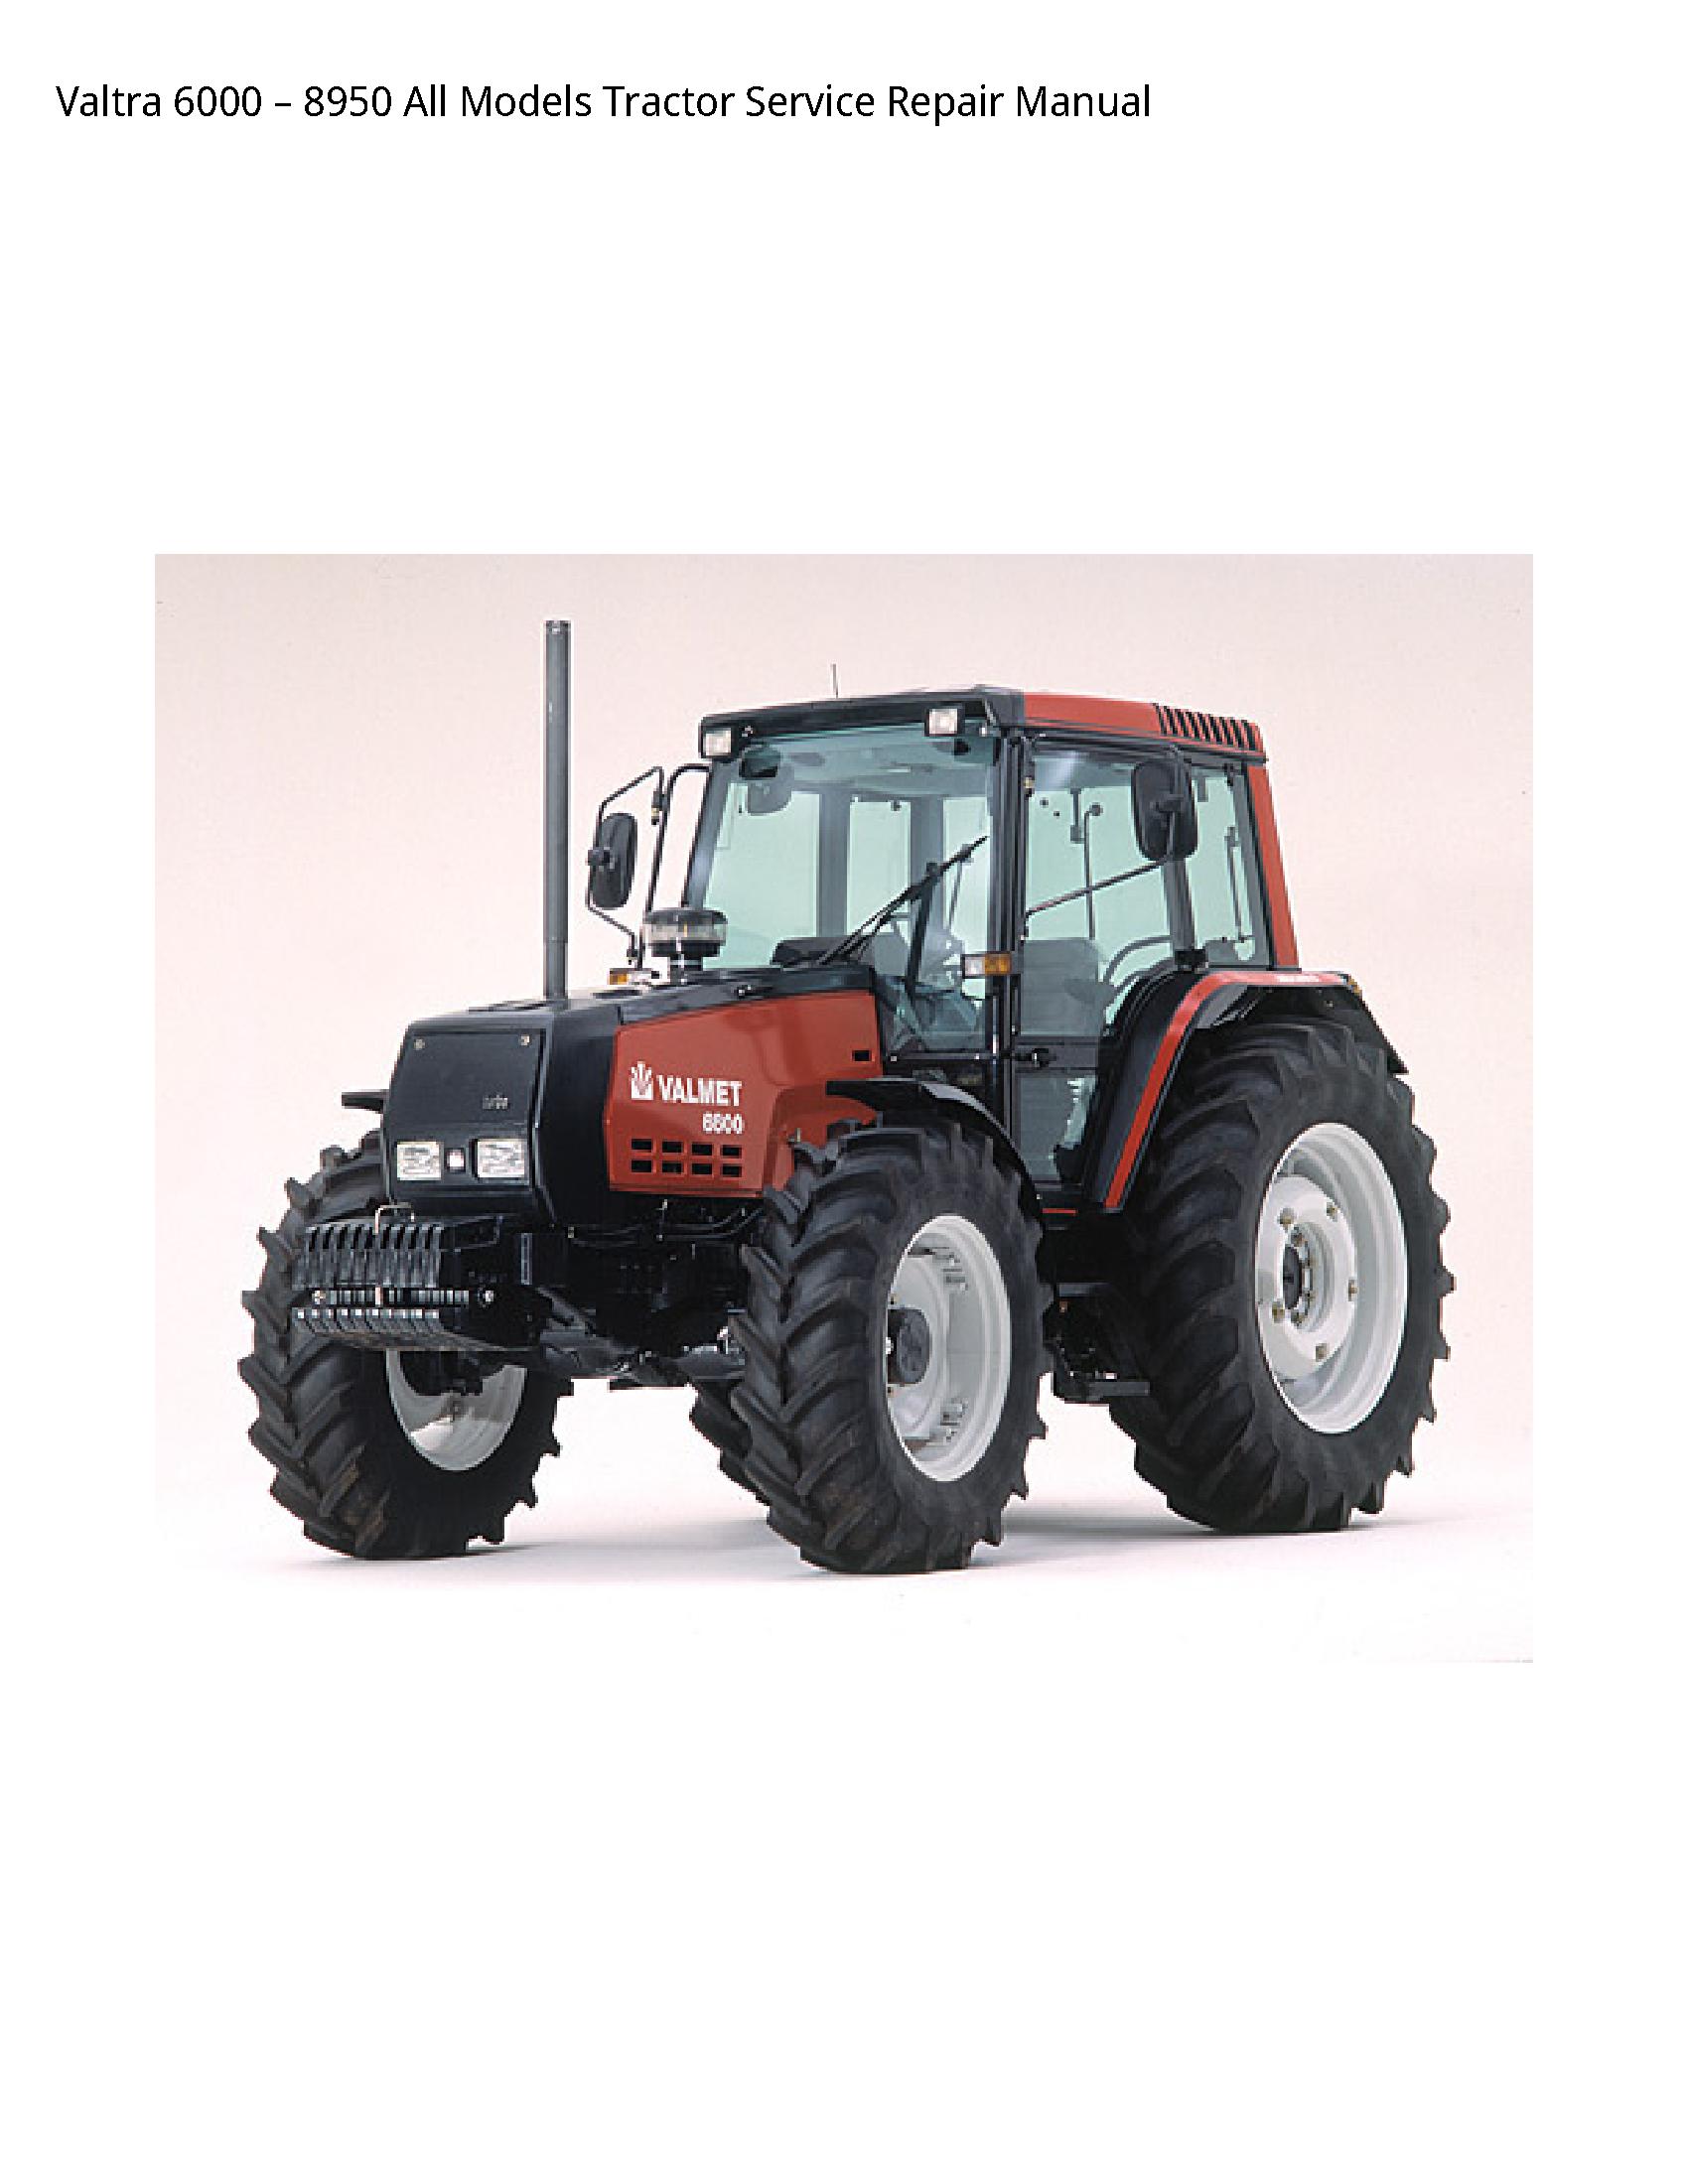 Valtra 6000 All Tractor manual